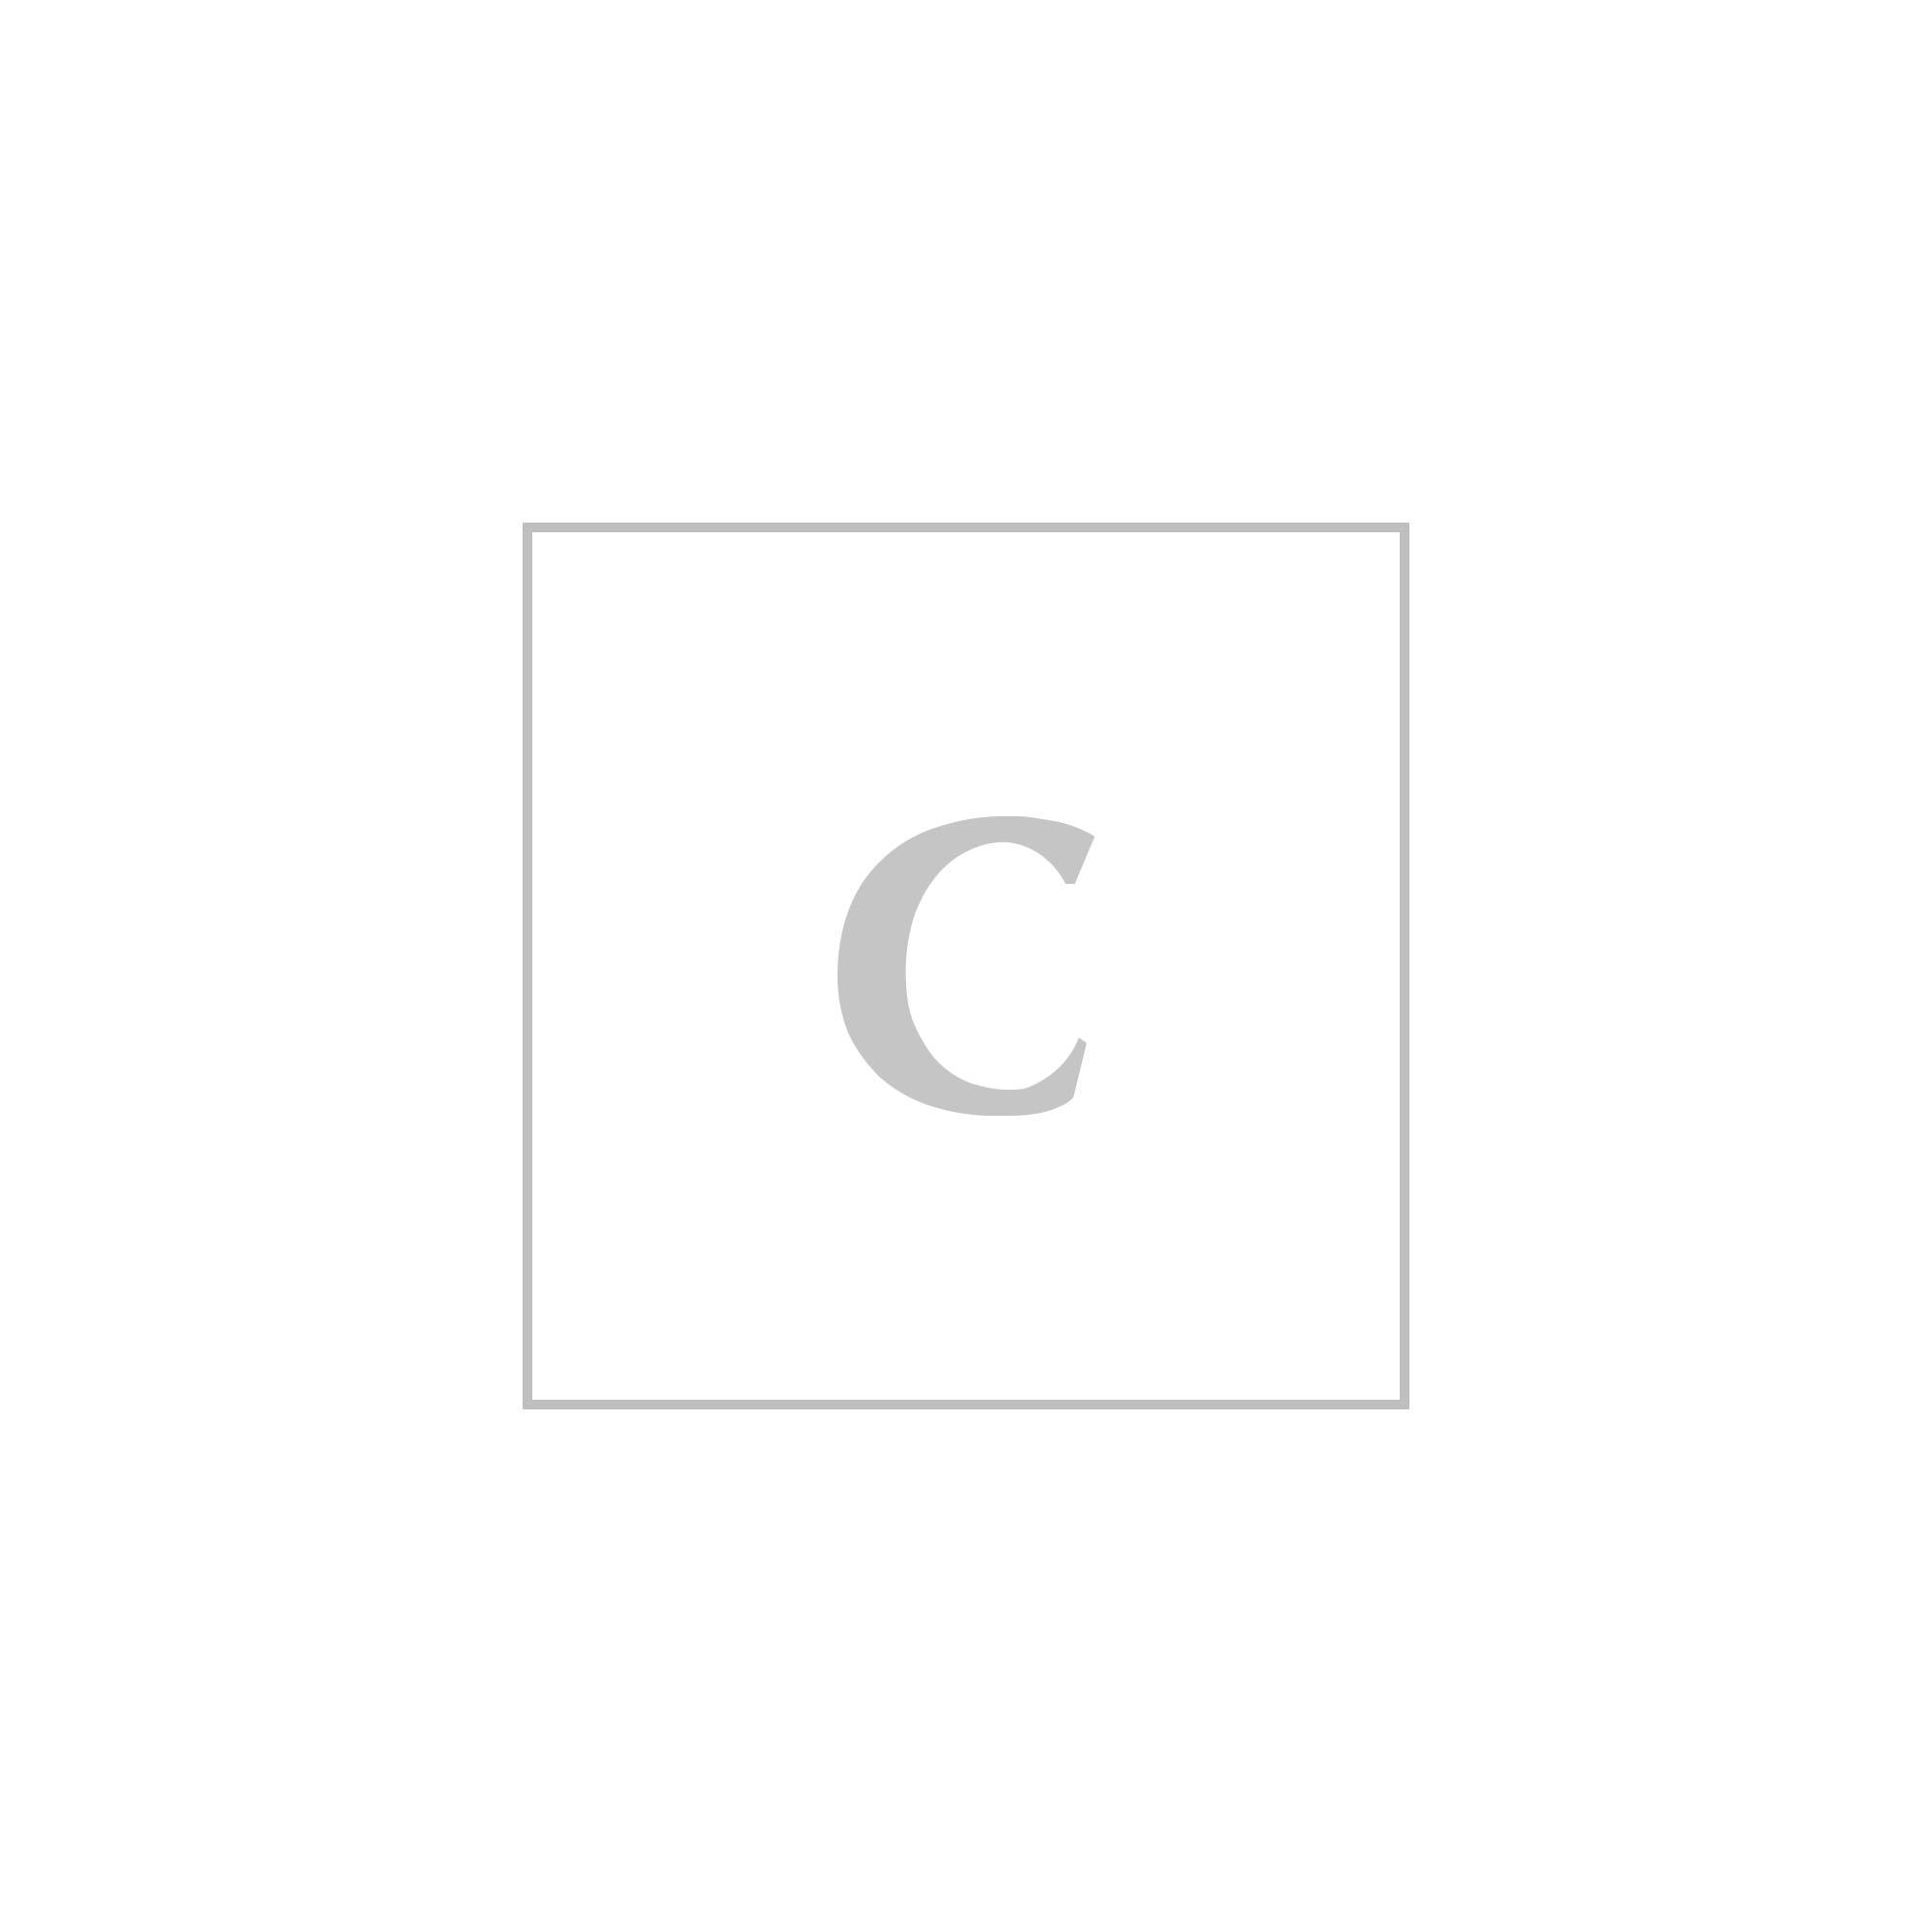 Michael kors borsa cinthia medium satchel